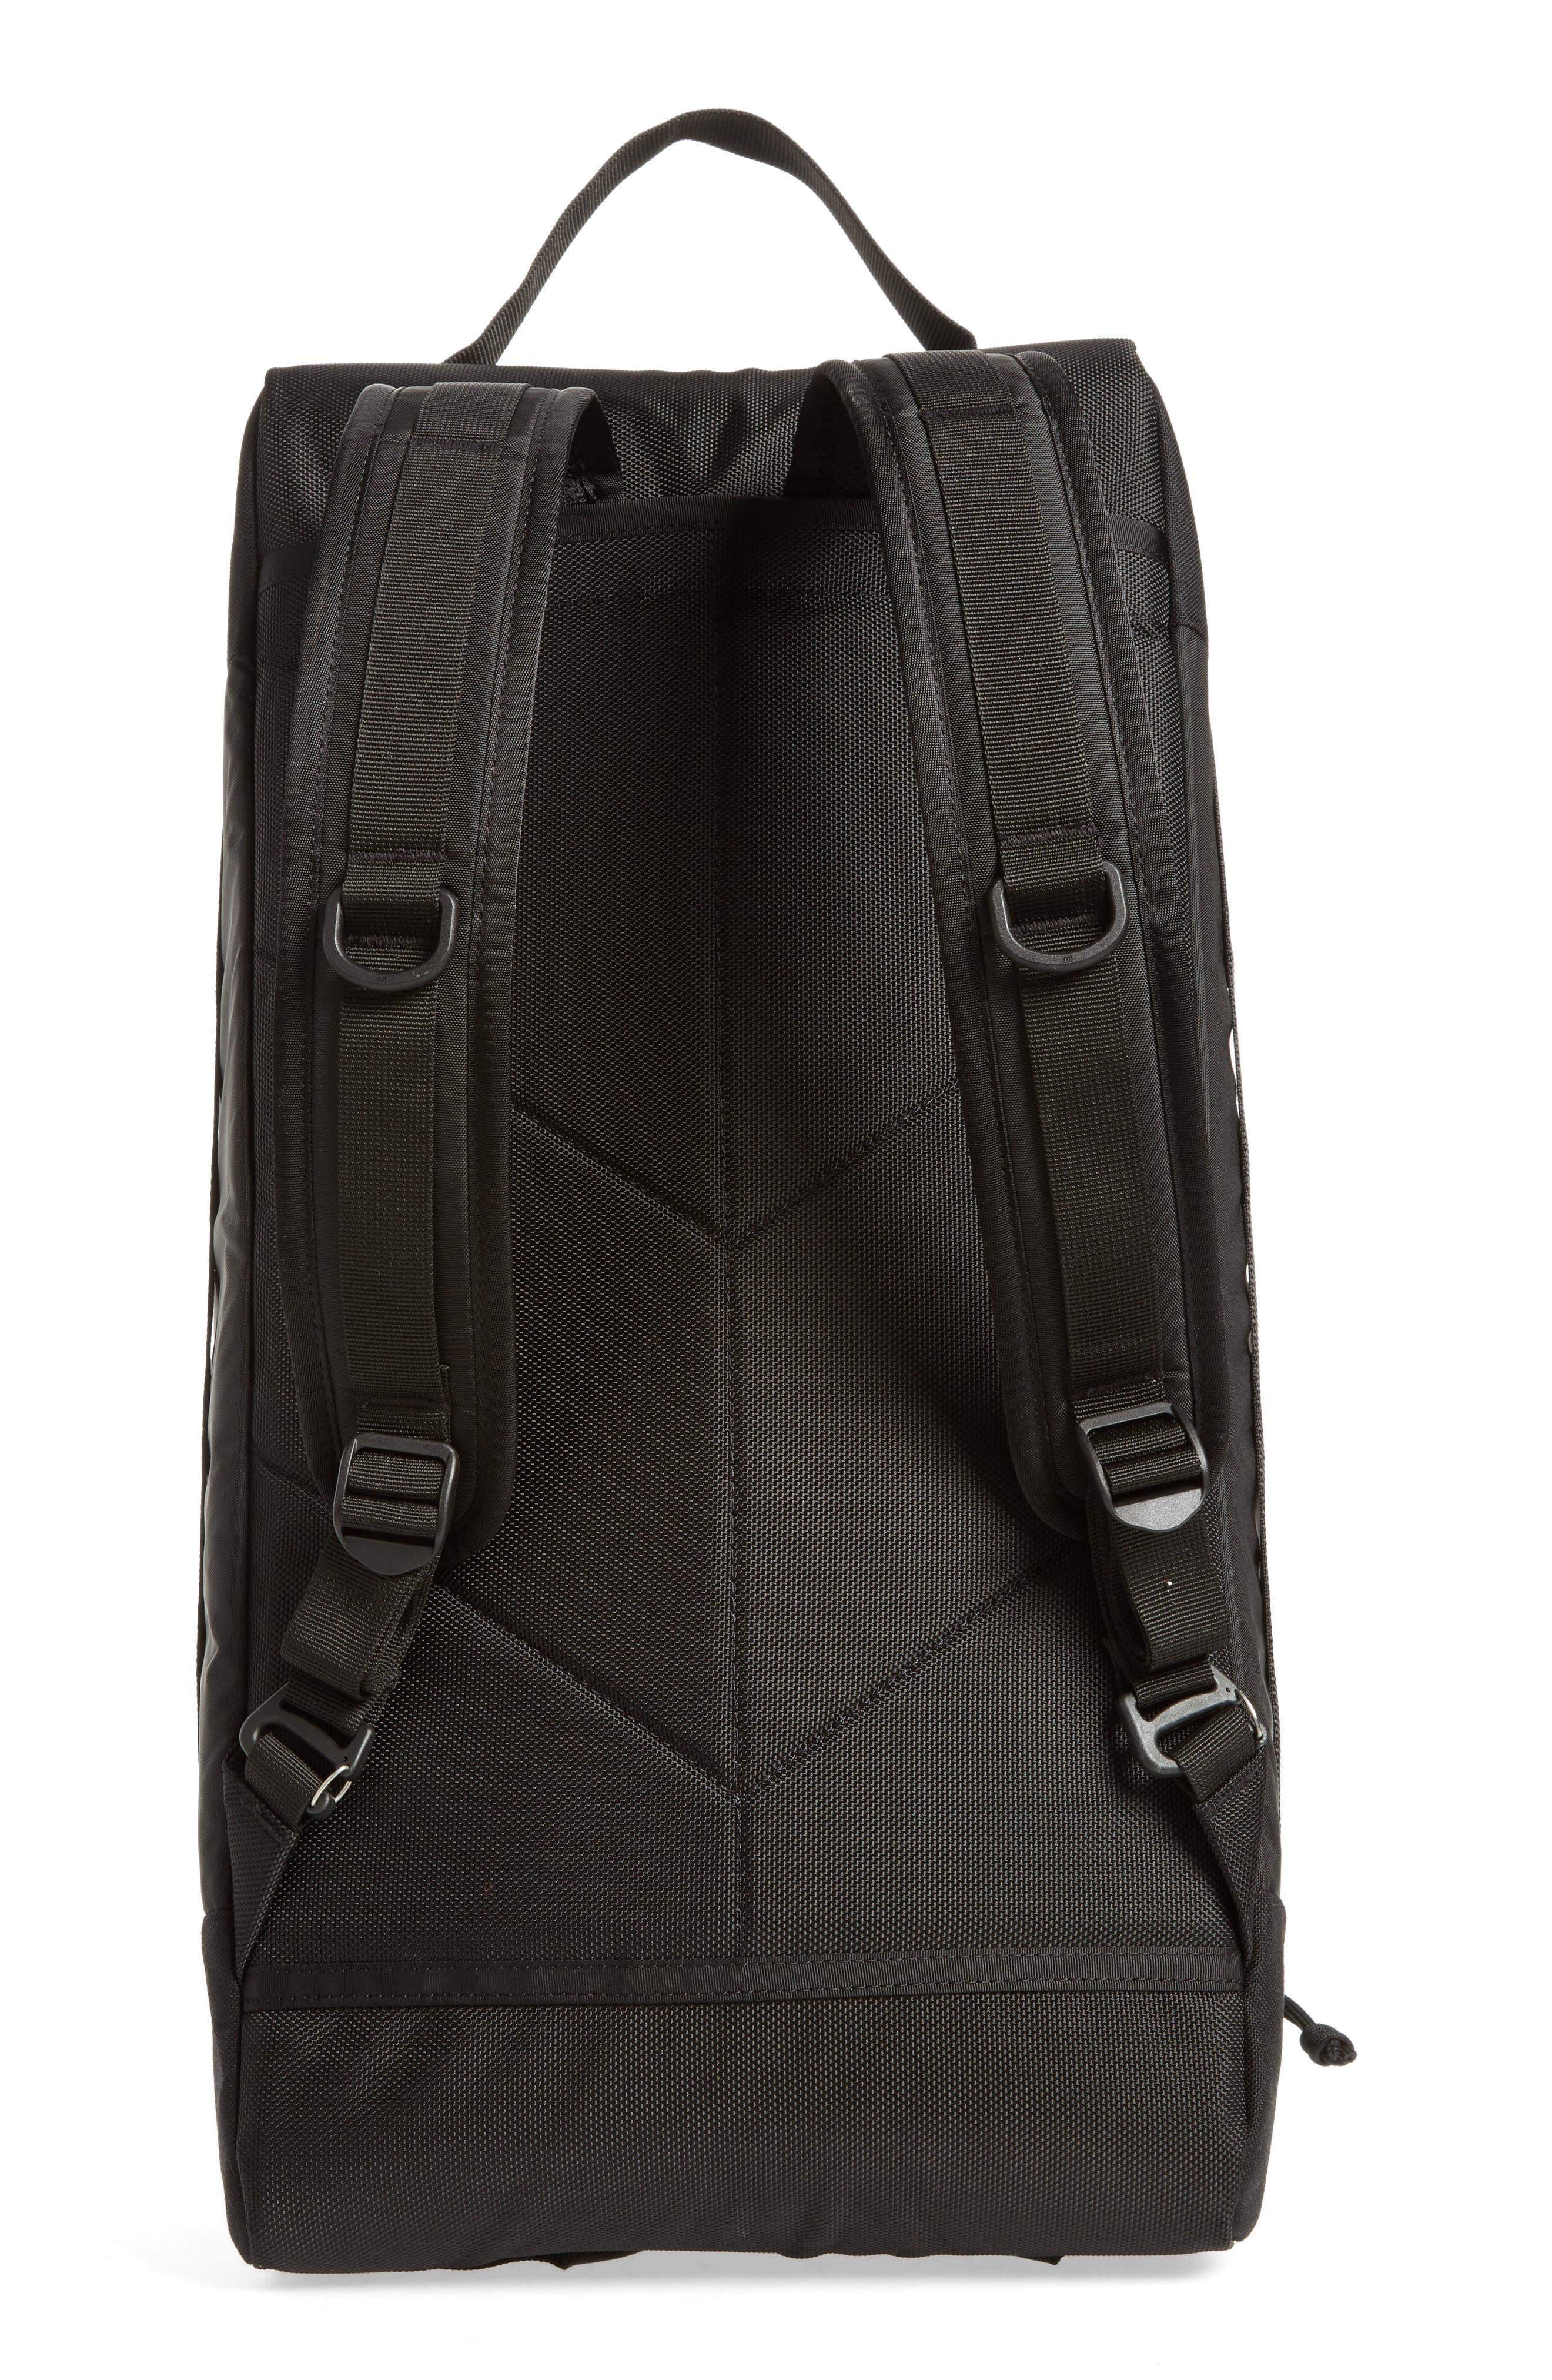 Mountain Convertible Duffel Bag,                             Alternate thumbnail 3, color,                             BLACK